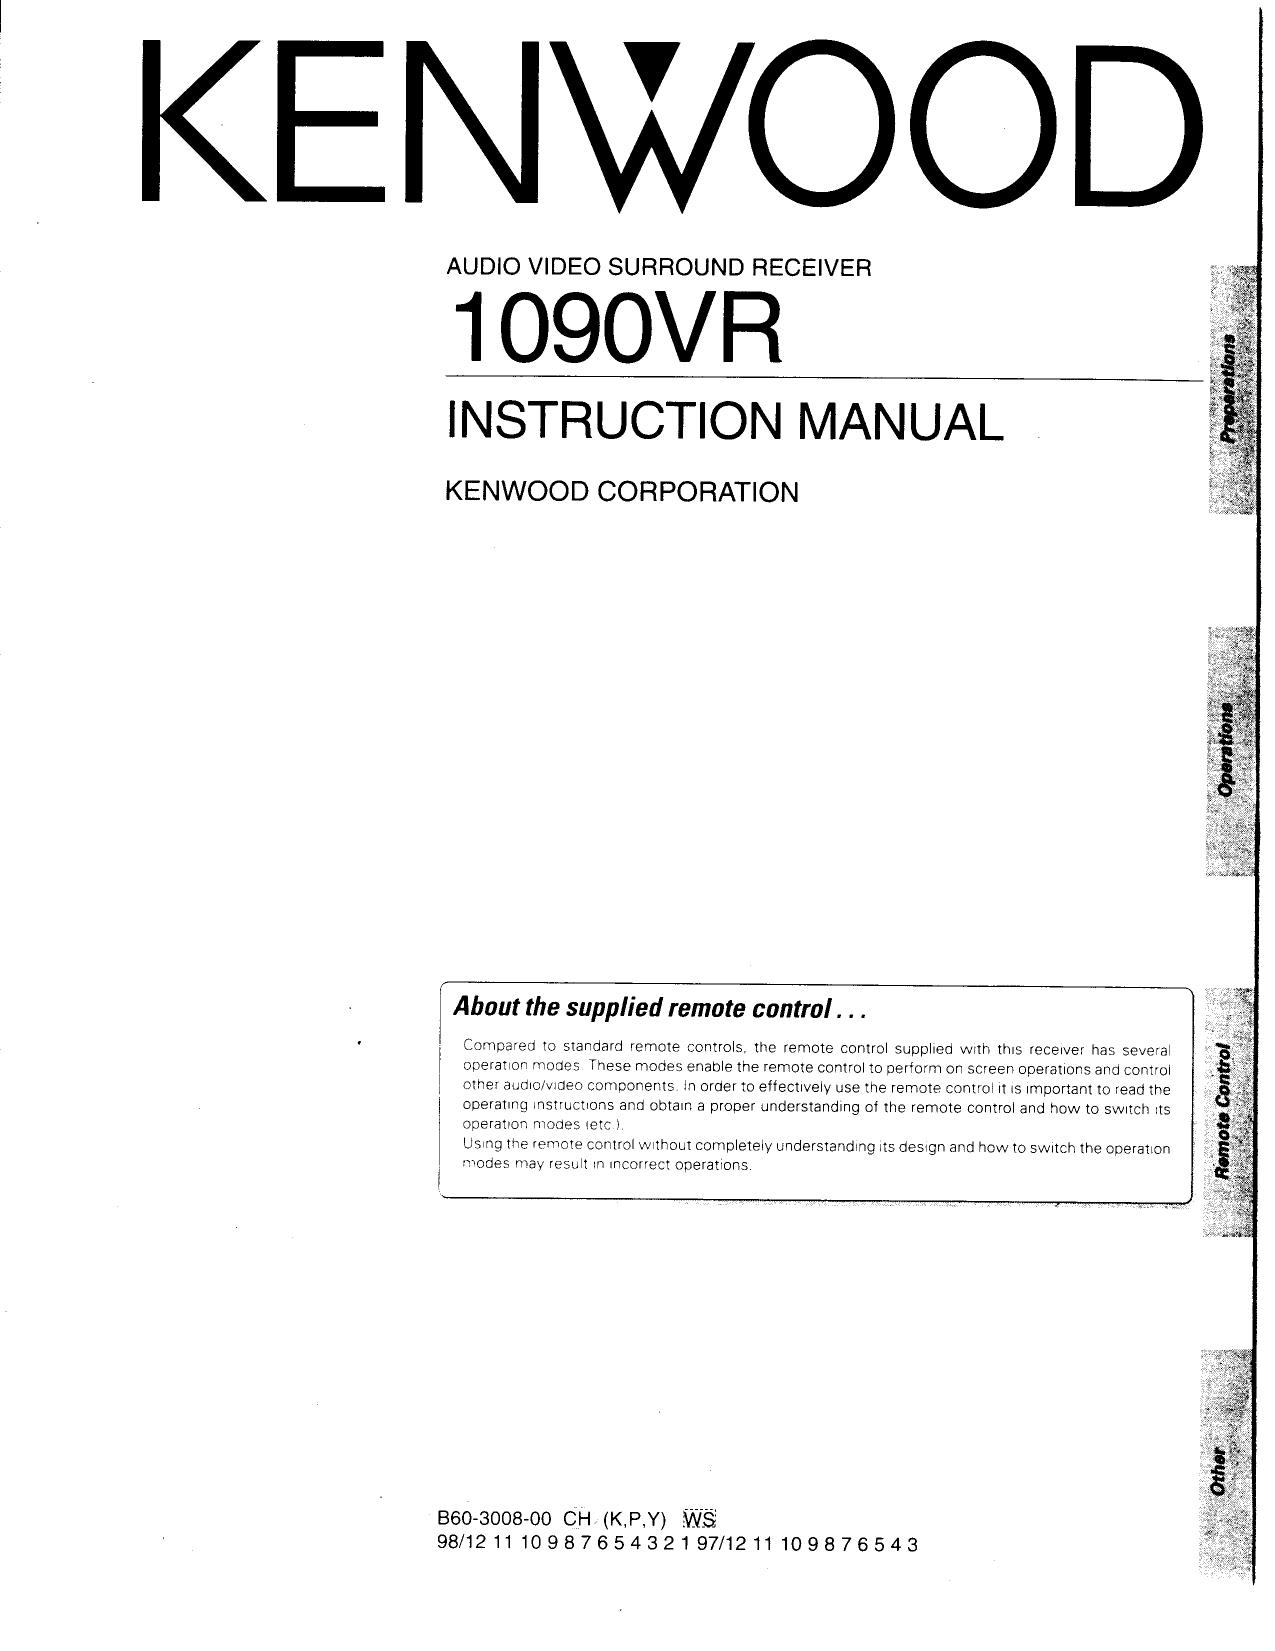 Wiring Diagram Kenwood Excelon Kdc X794 Kenwood Kvt 512